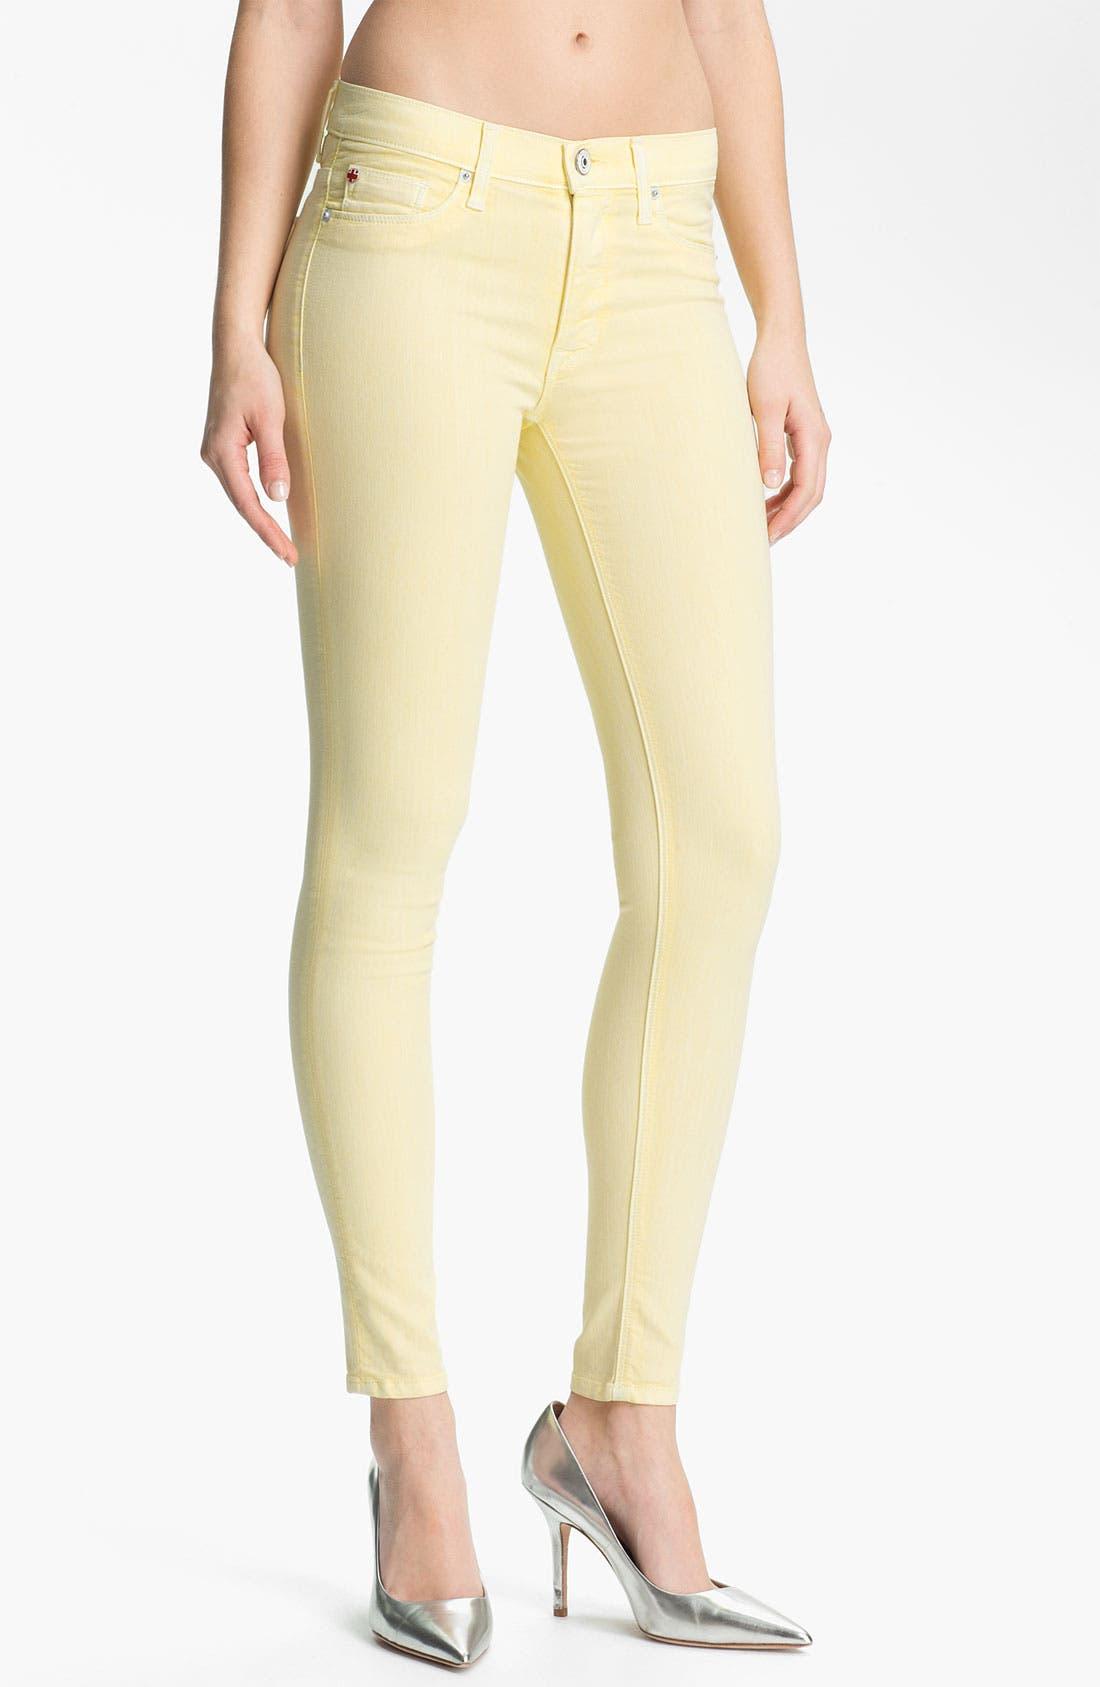 Main Image - Hudson Jeans 'Nico' Skinny Overdyed Jeans (Banana)